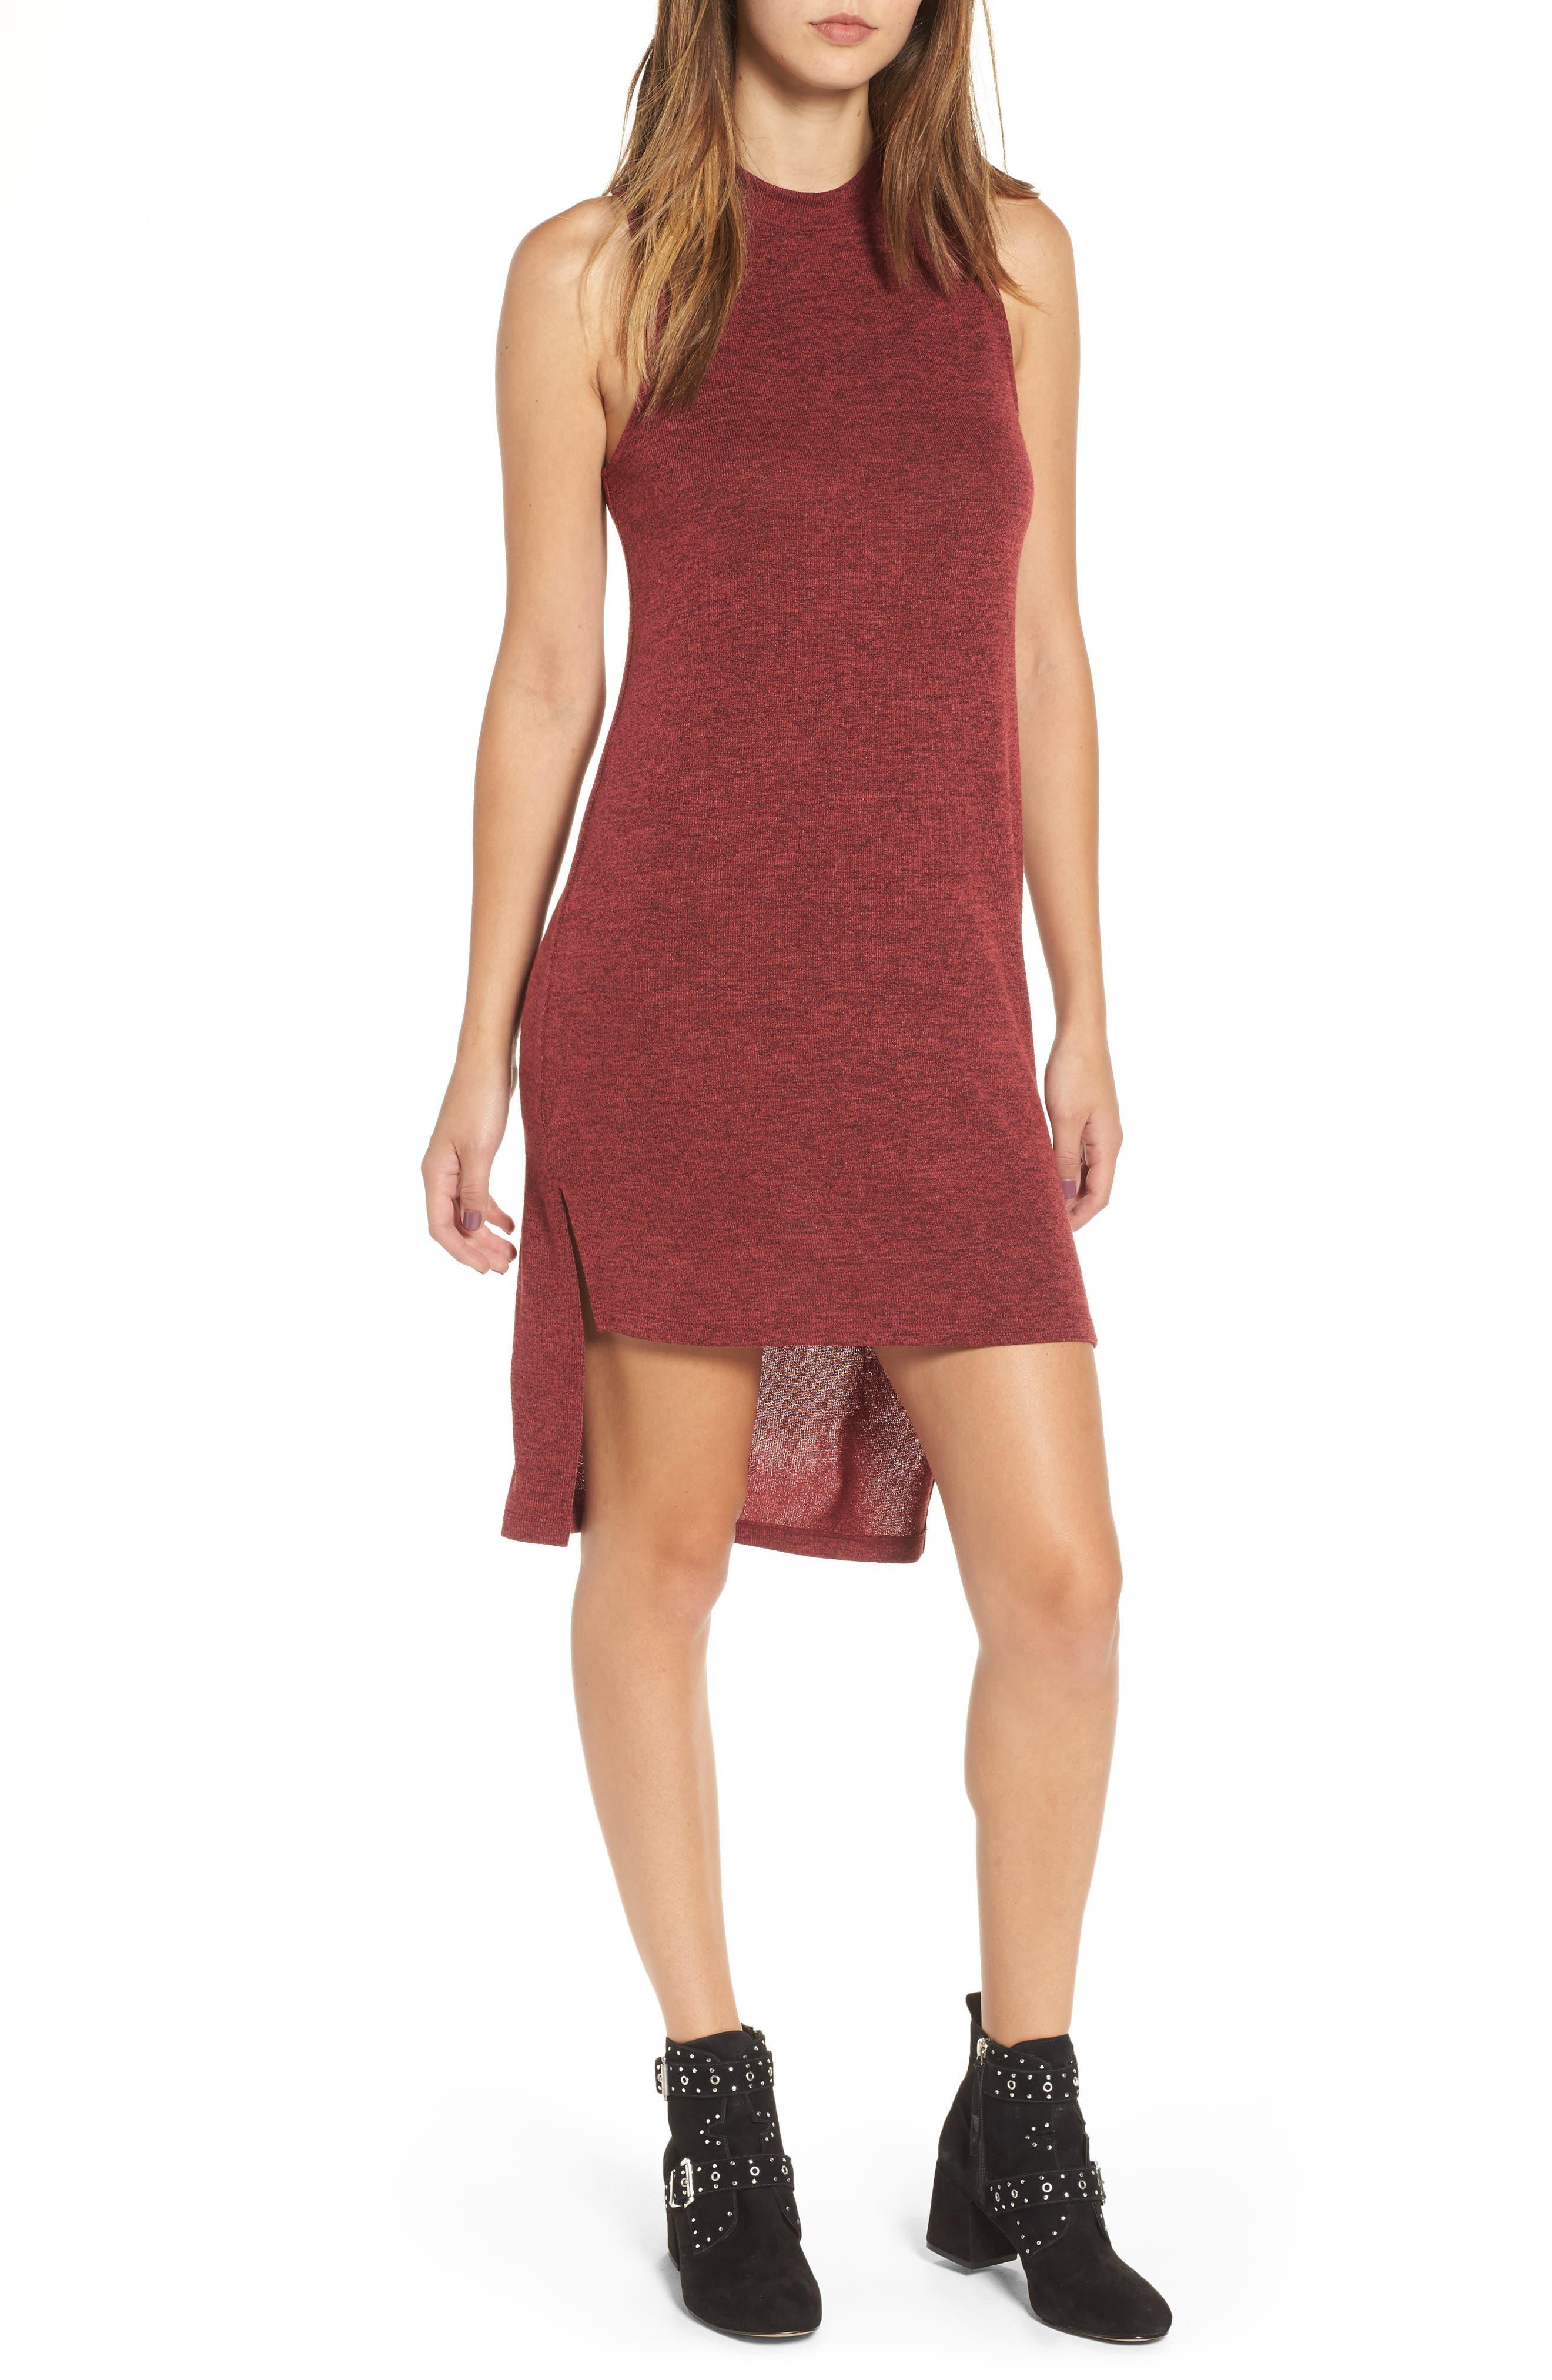 Everly Mock Neck Sleeveless Midi Dress